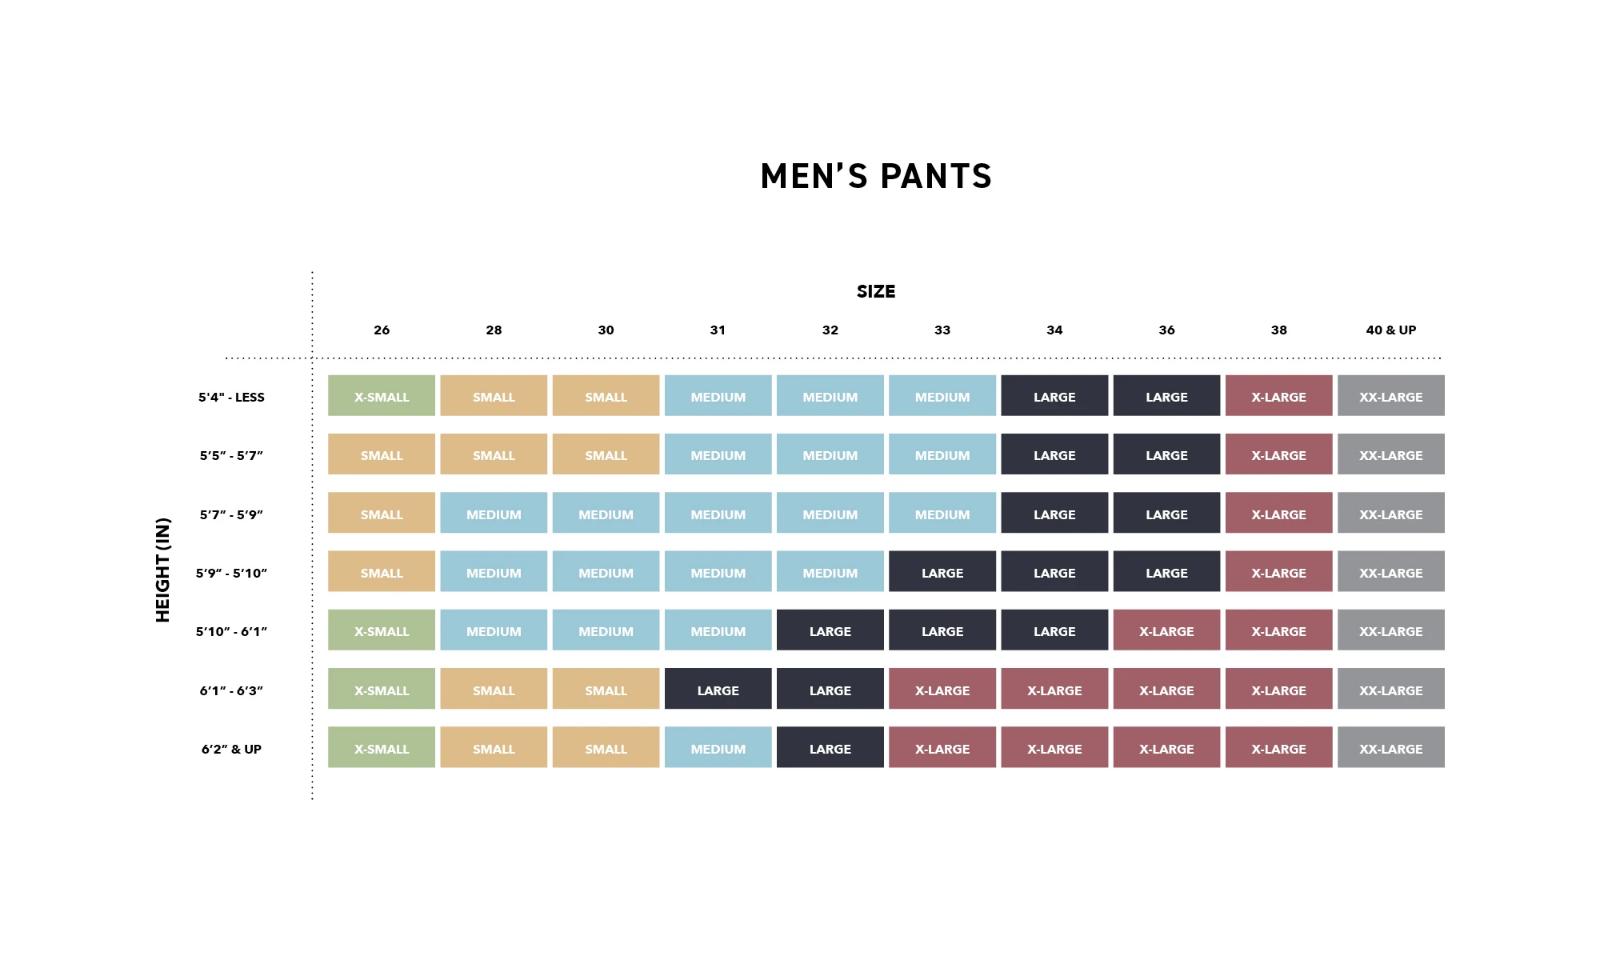 686 Men's Snowpant Size Guide